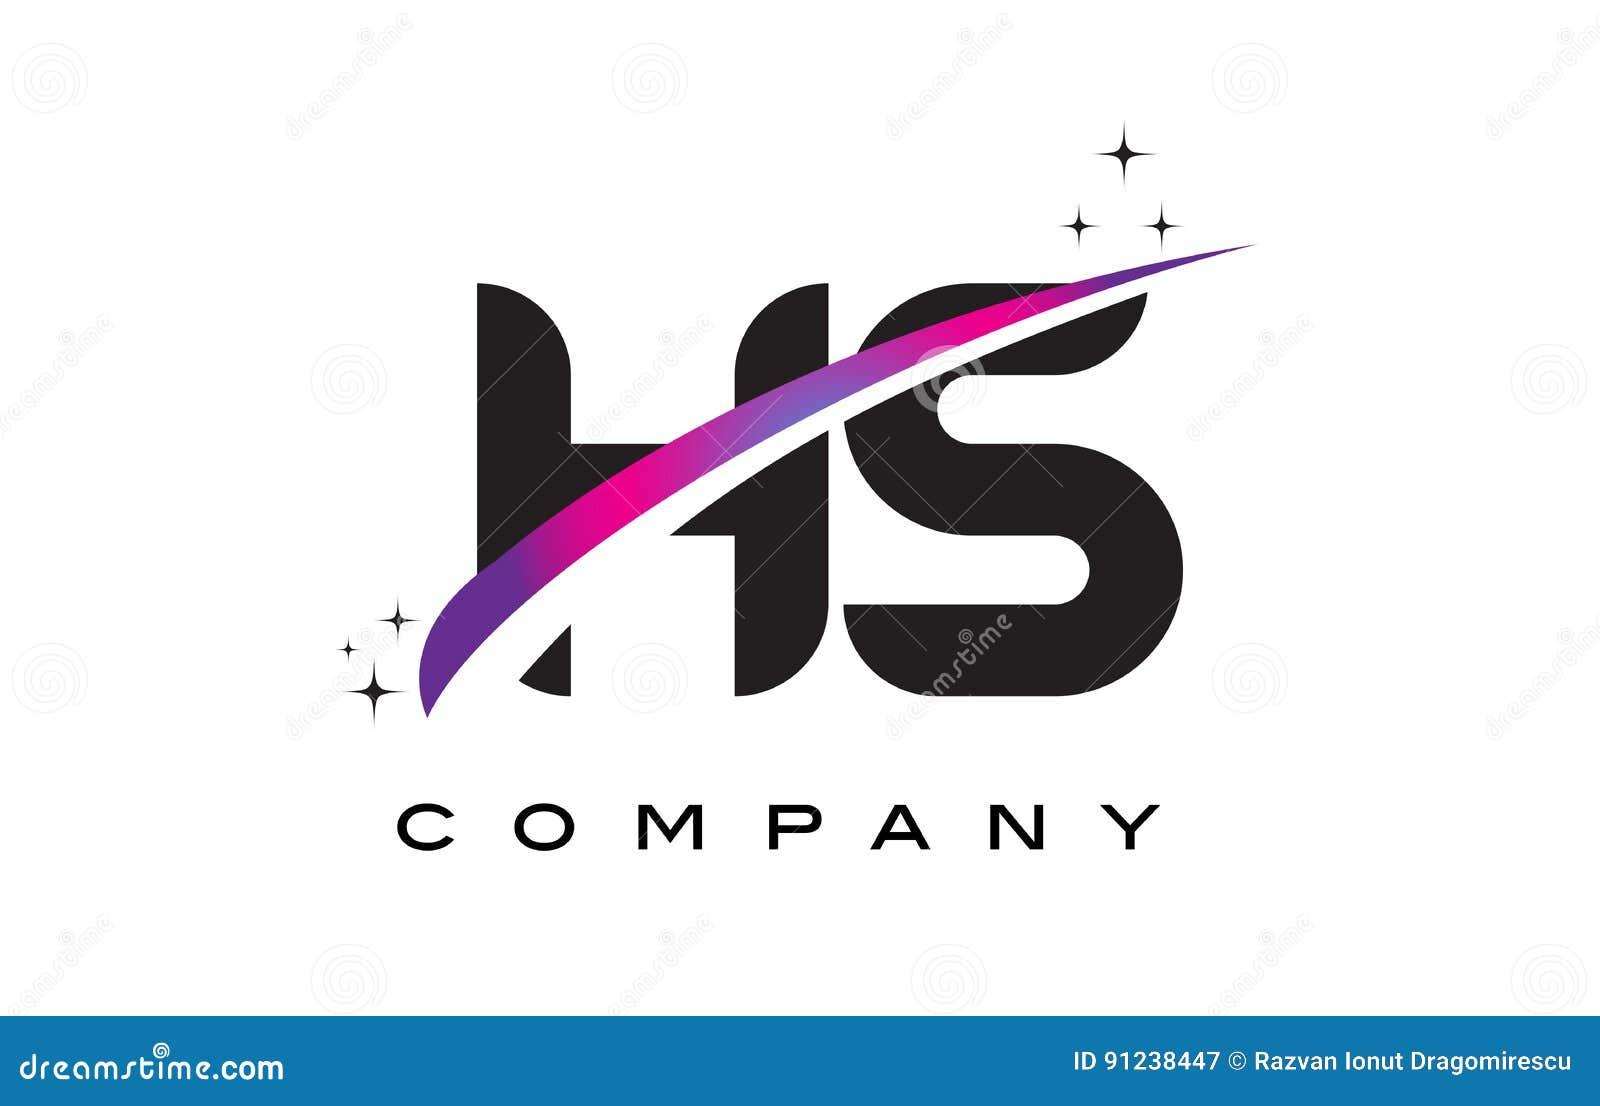 hs h s black letter logo design with purple magenta swoosh stock